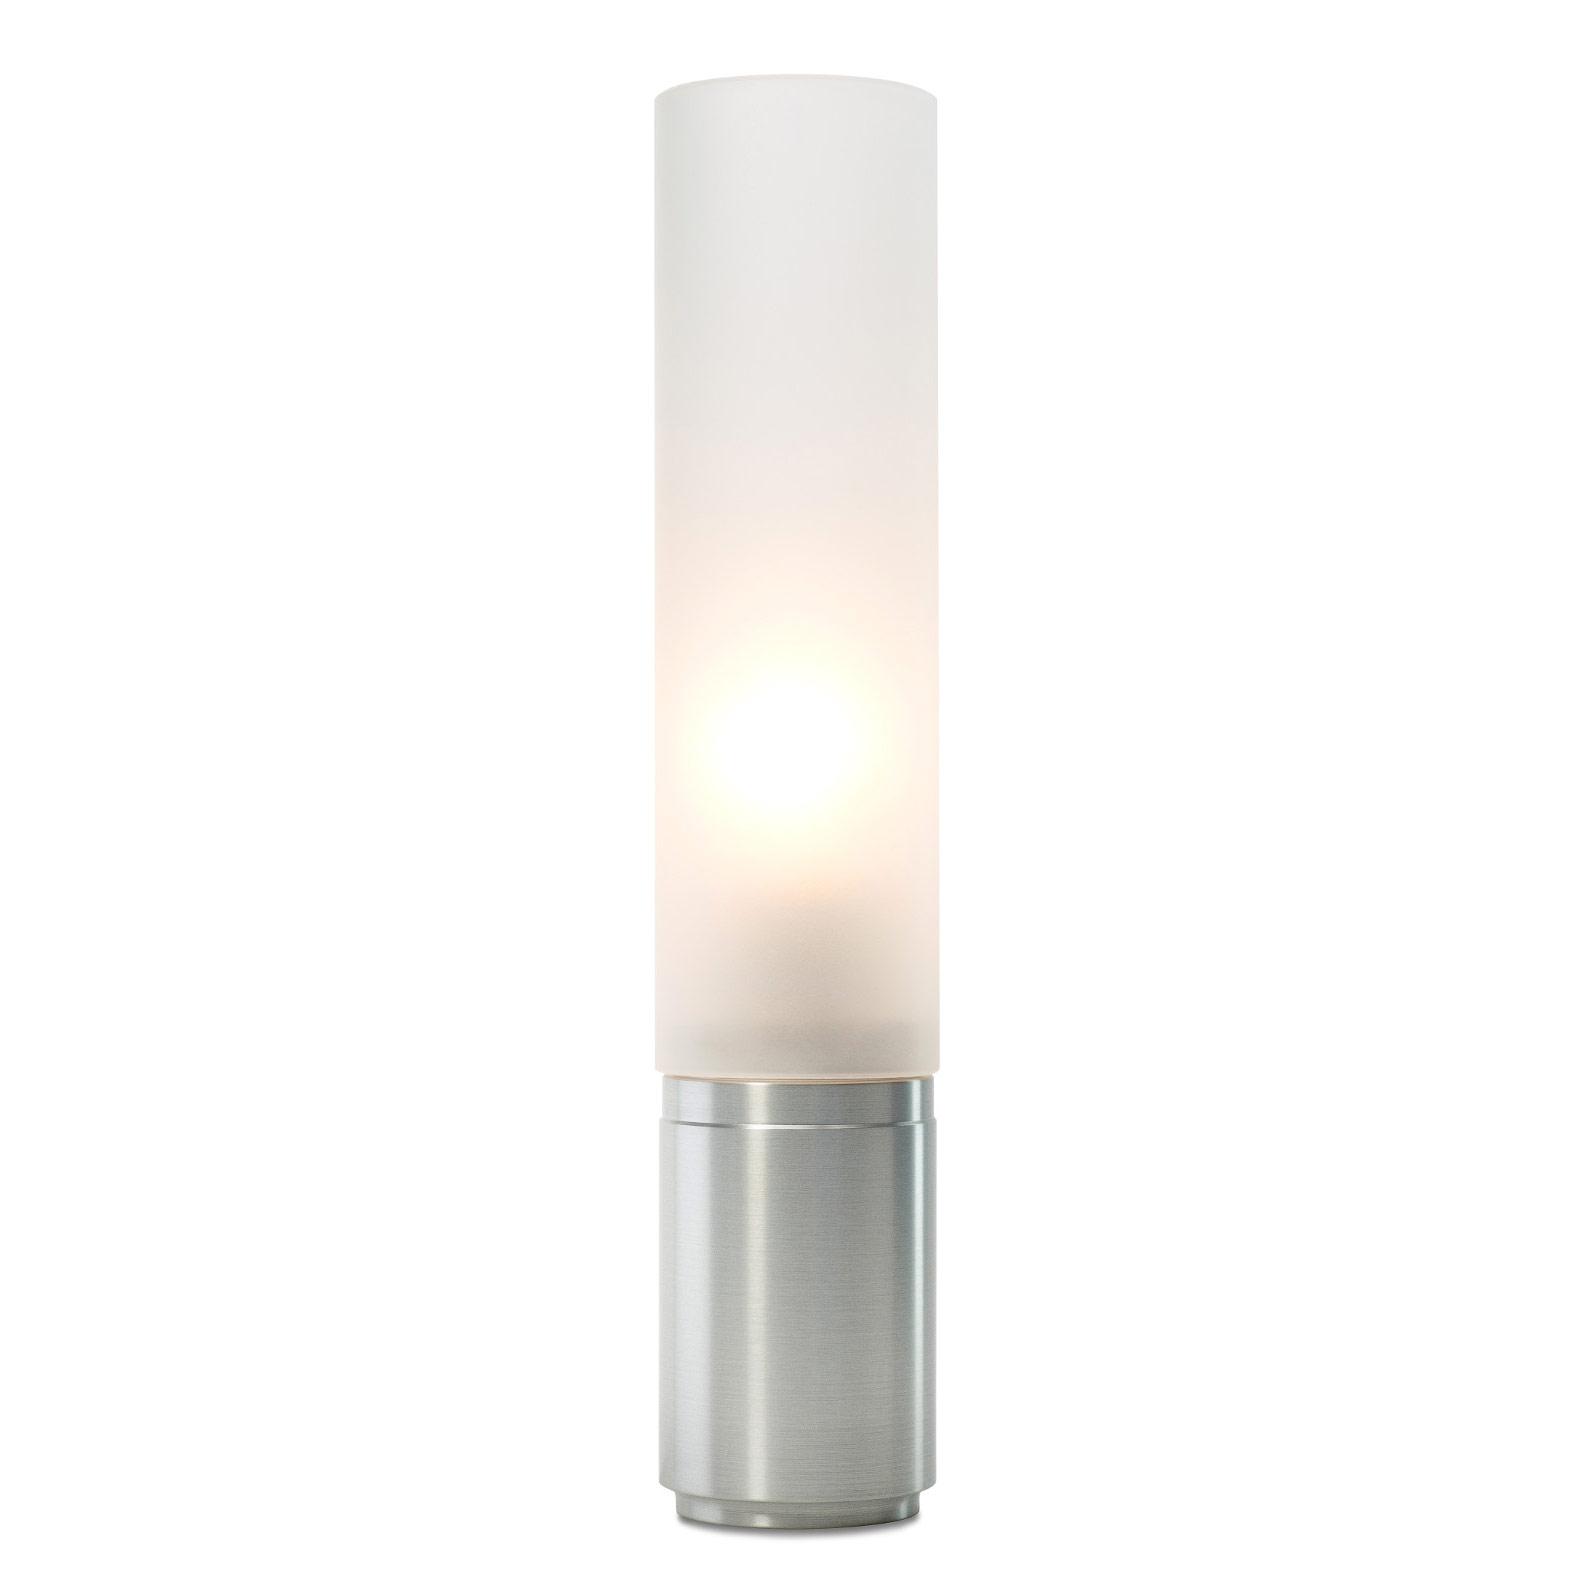 Elise Table Lamp By Pablo | ELIS 12 SLV